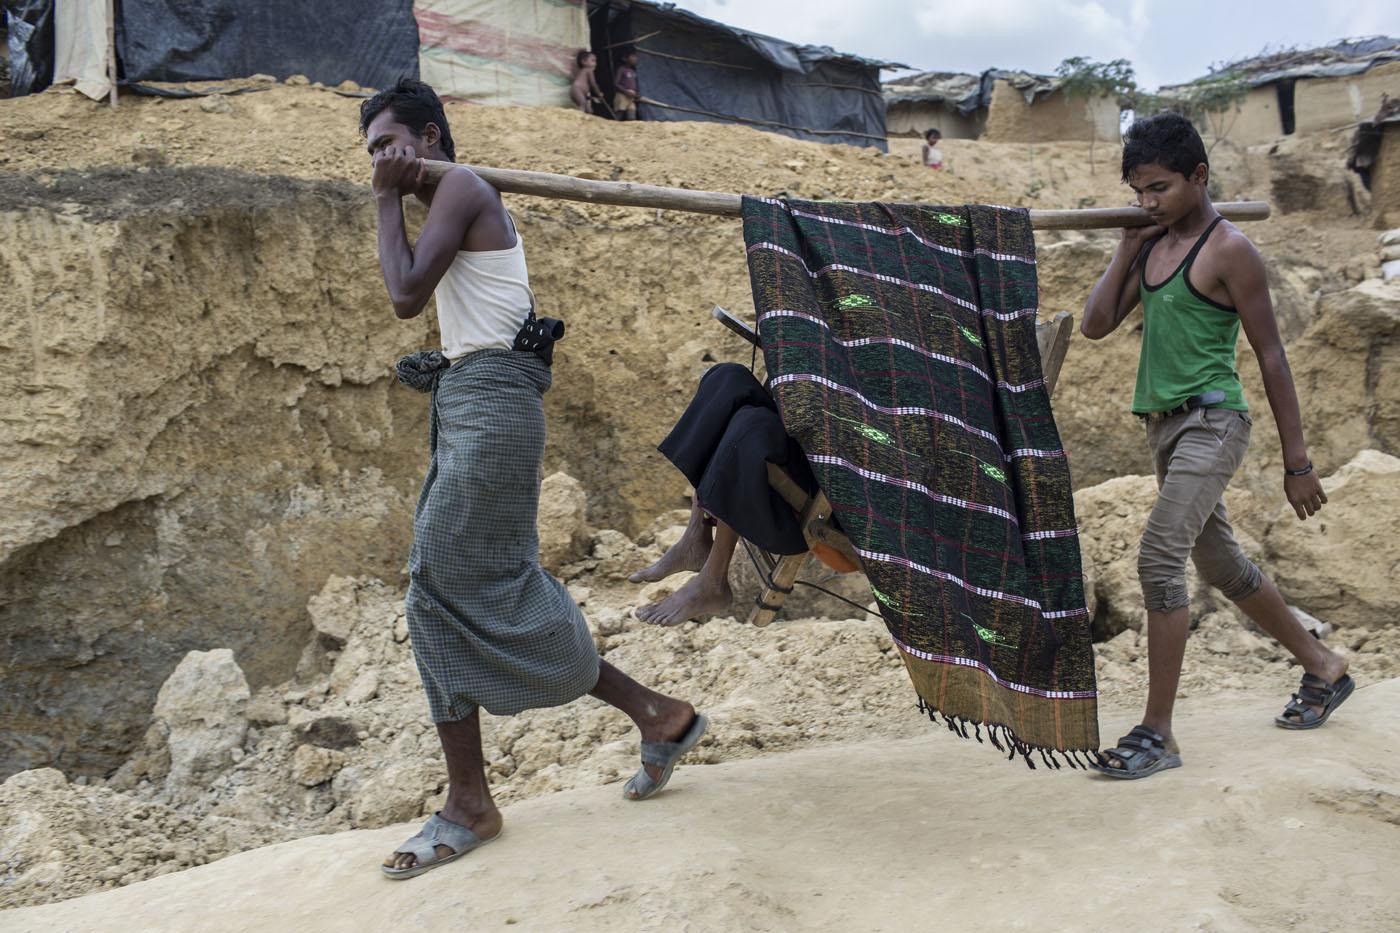 Probal Rashid_Bangladesh_The Rohingyas-A People Without A Home_03.jpg